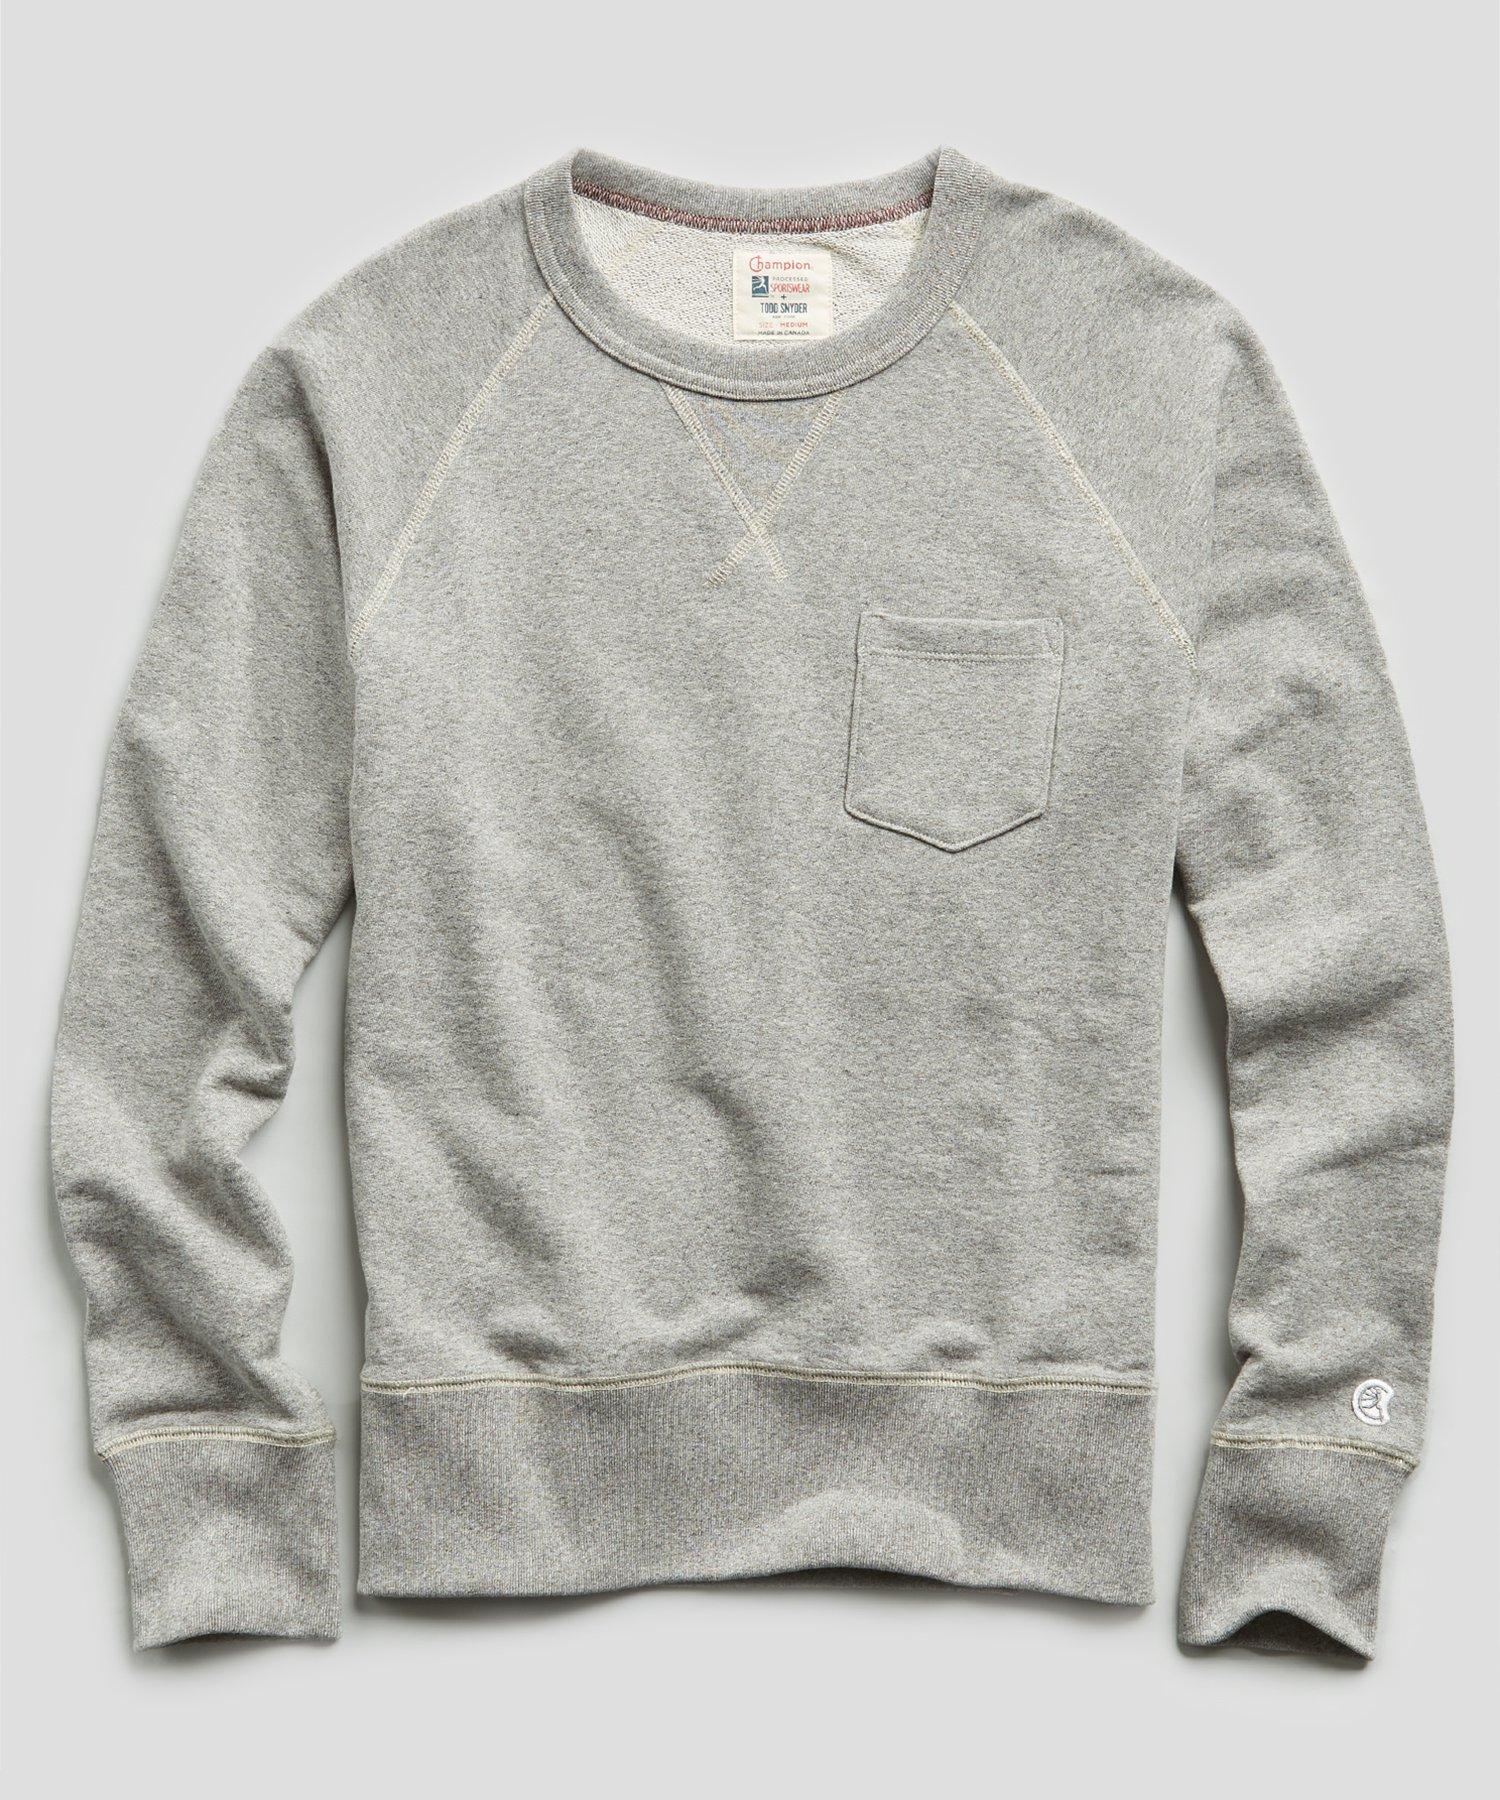 Todd Snyder Grey Crewneck Sweater